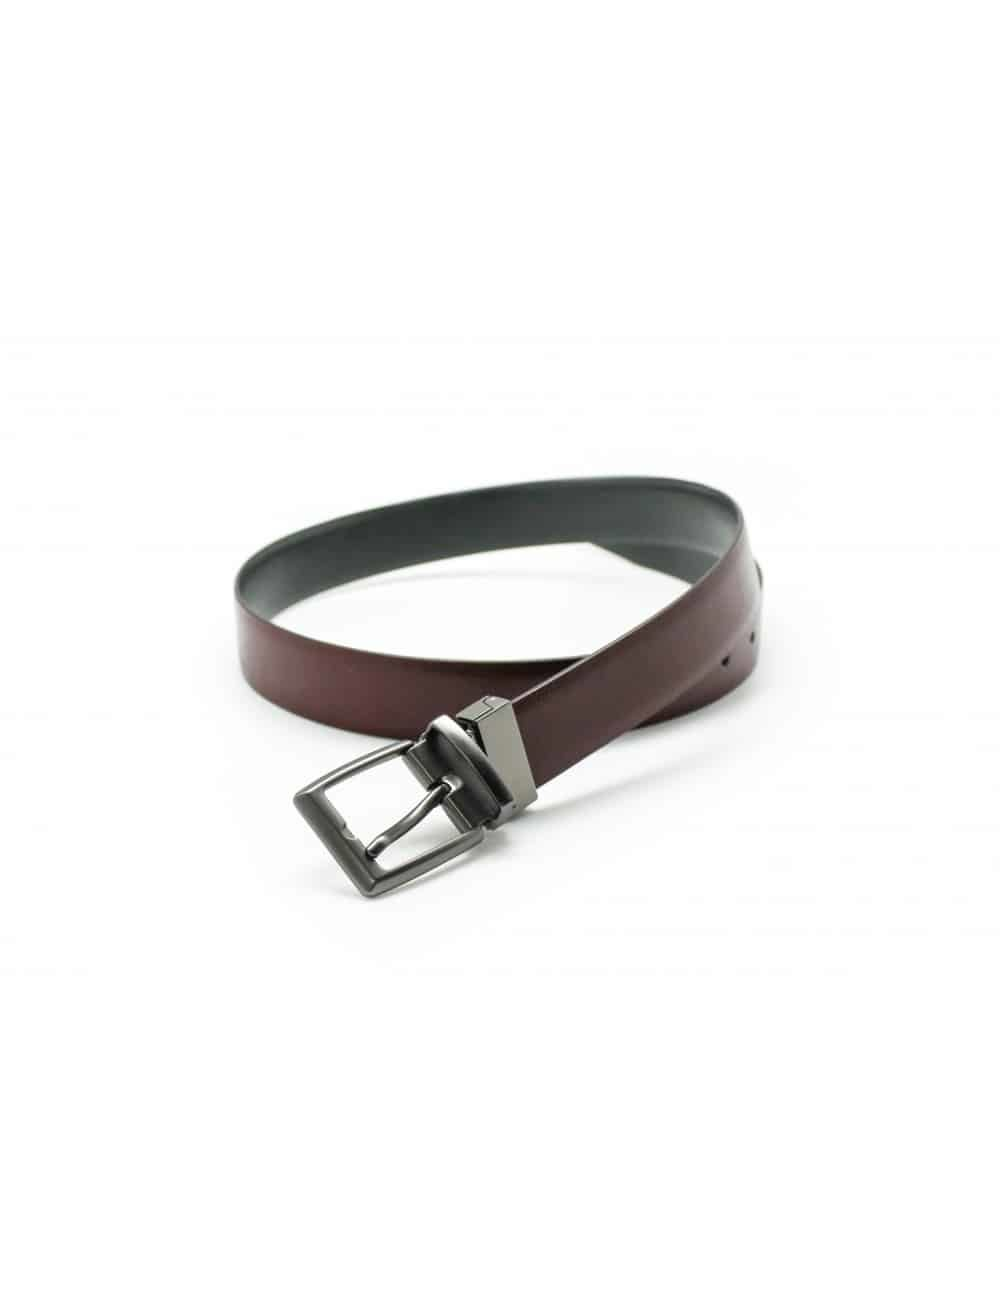 Wine / Dark Grey Reversible Leather Belt LBR12.5